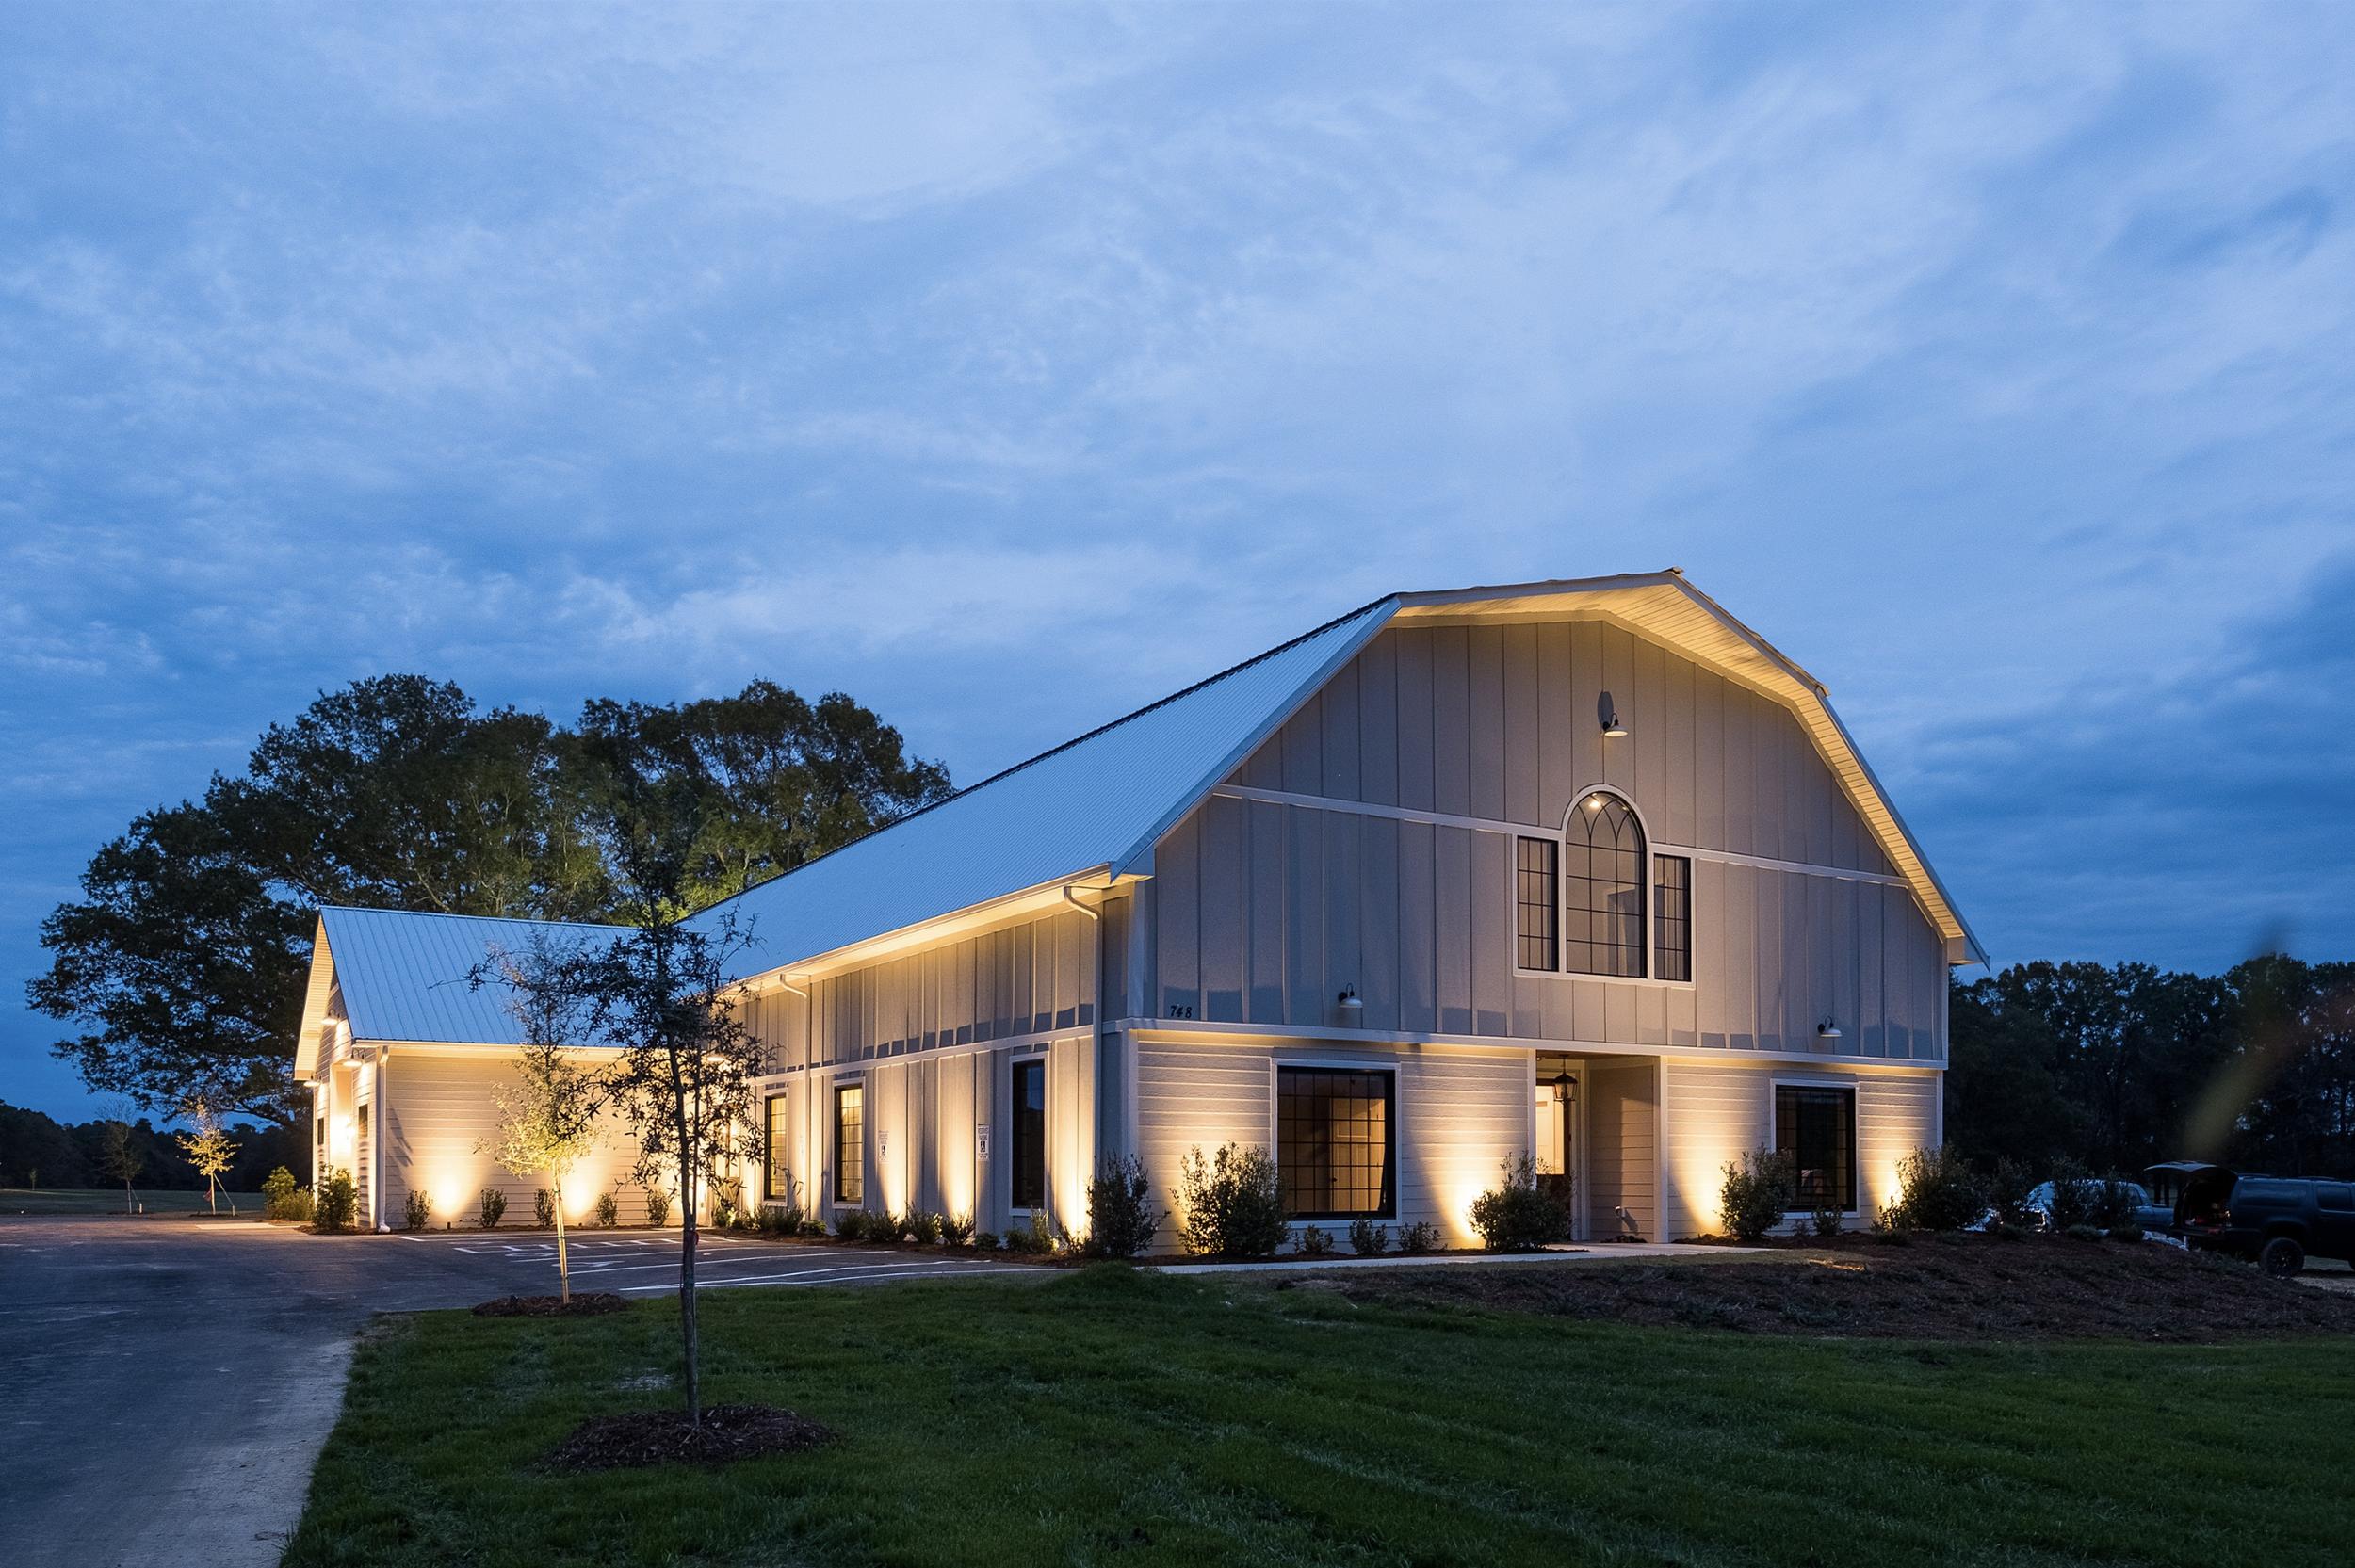 Tin Roof Farms